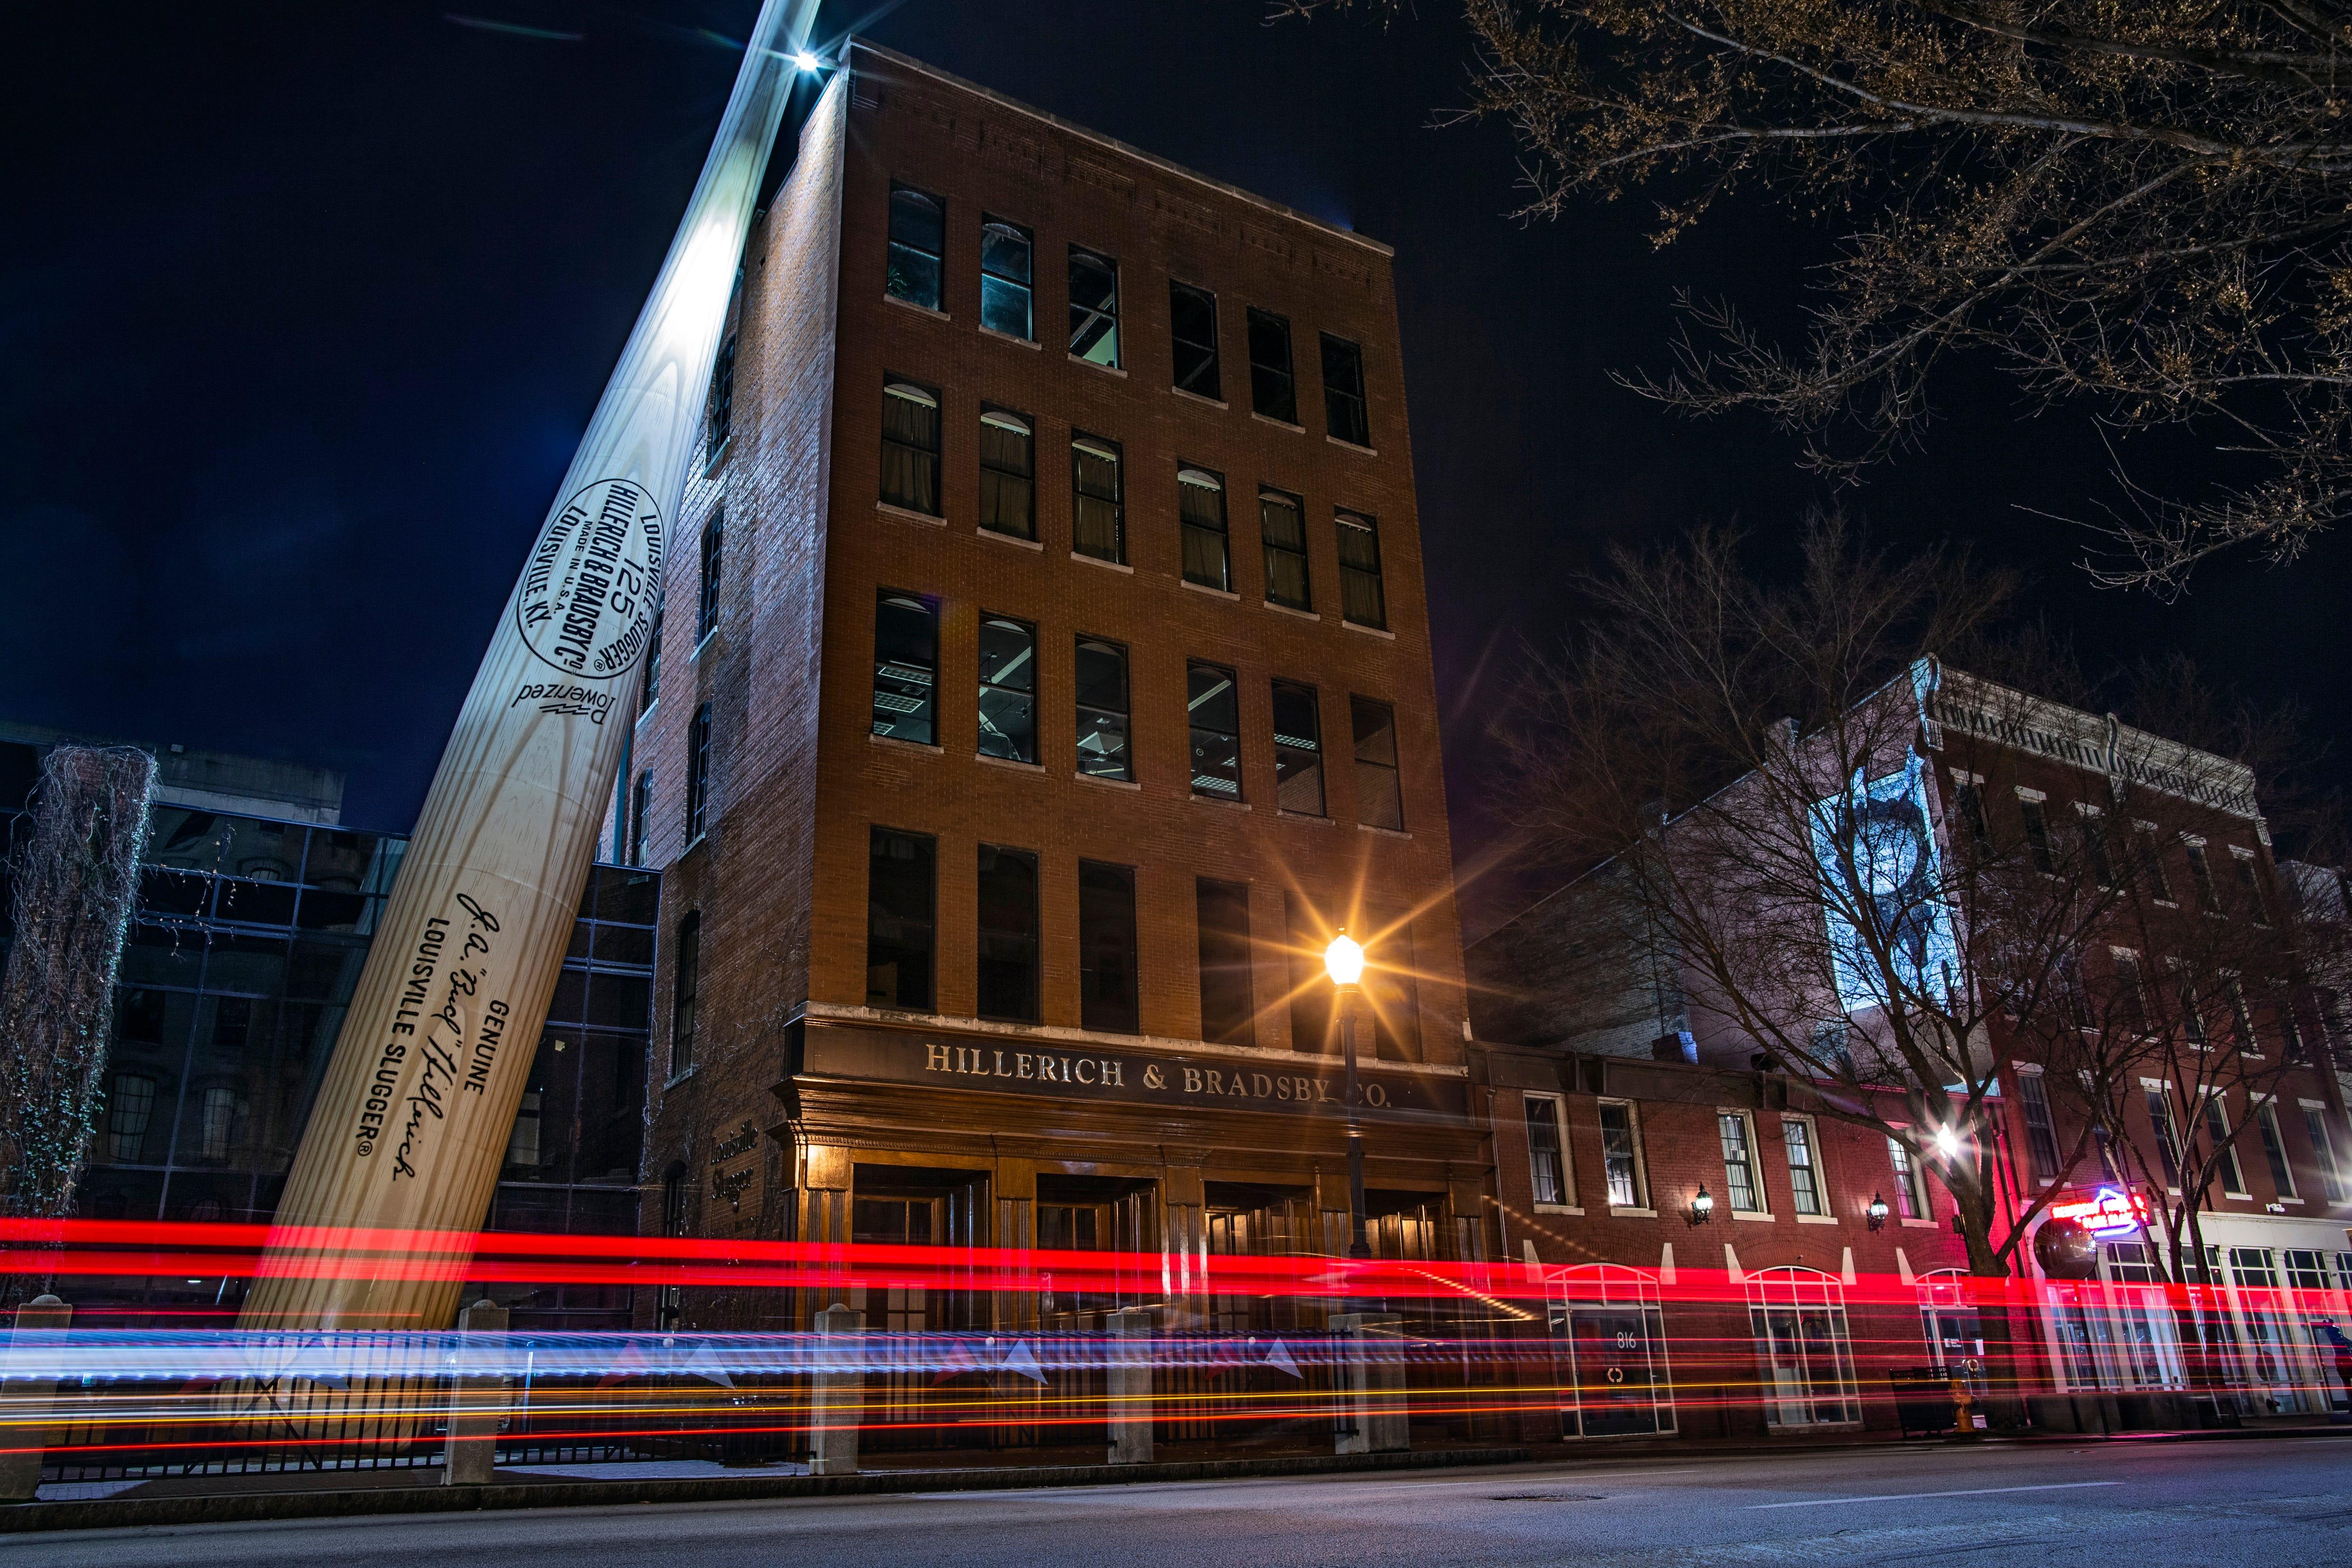 9:12 PMVehicles streak past outside the Louisville Slugger Museum on a quiet evening in downtown Louisville on Jan. 13, 2020.